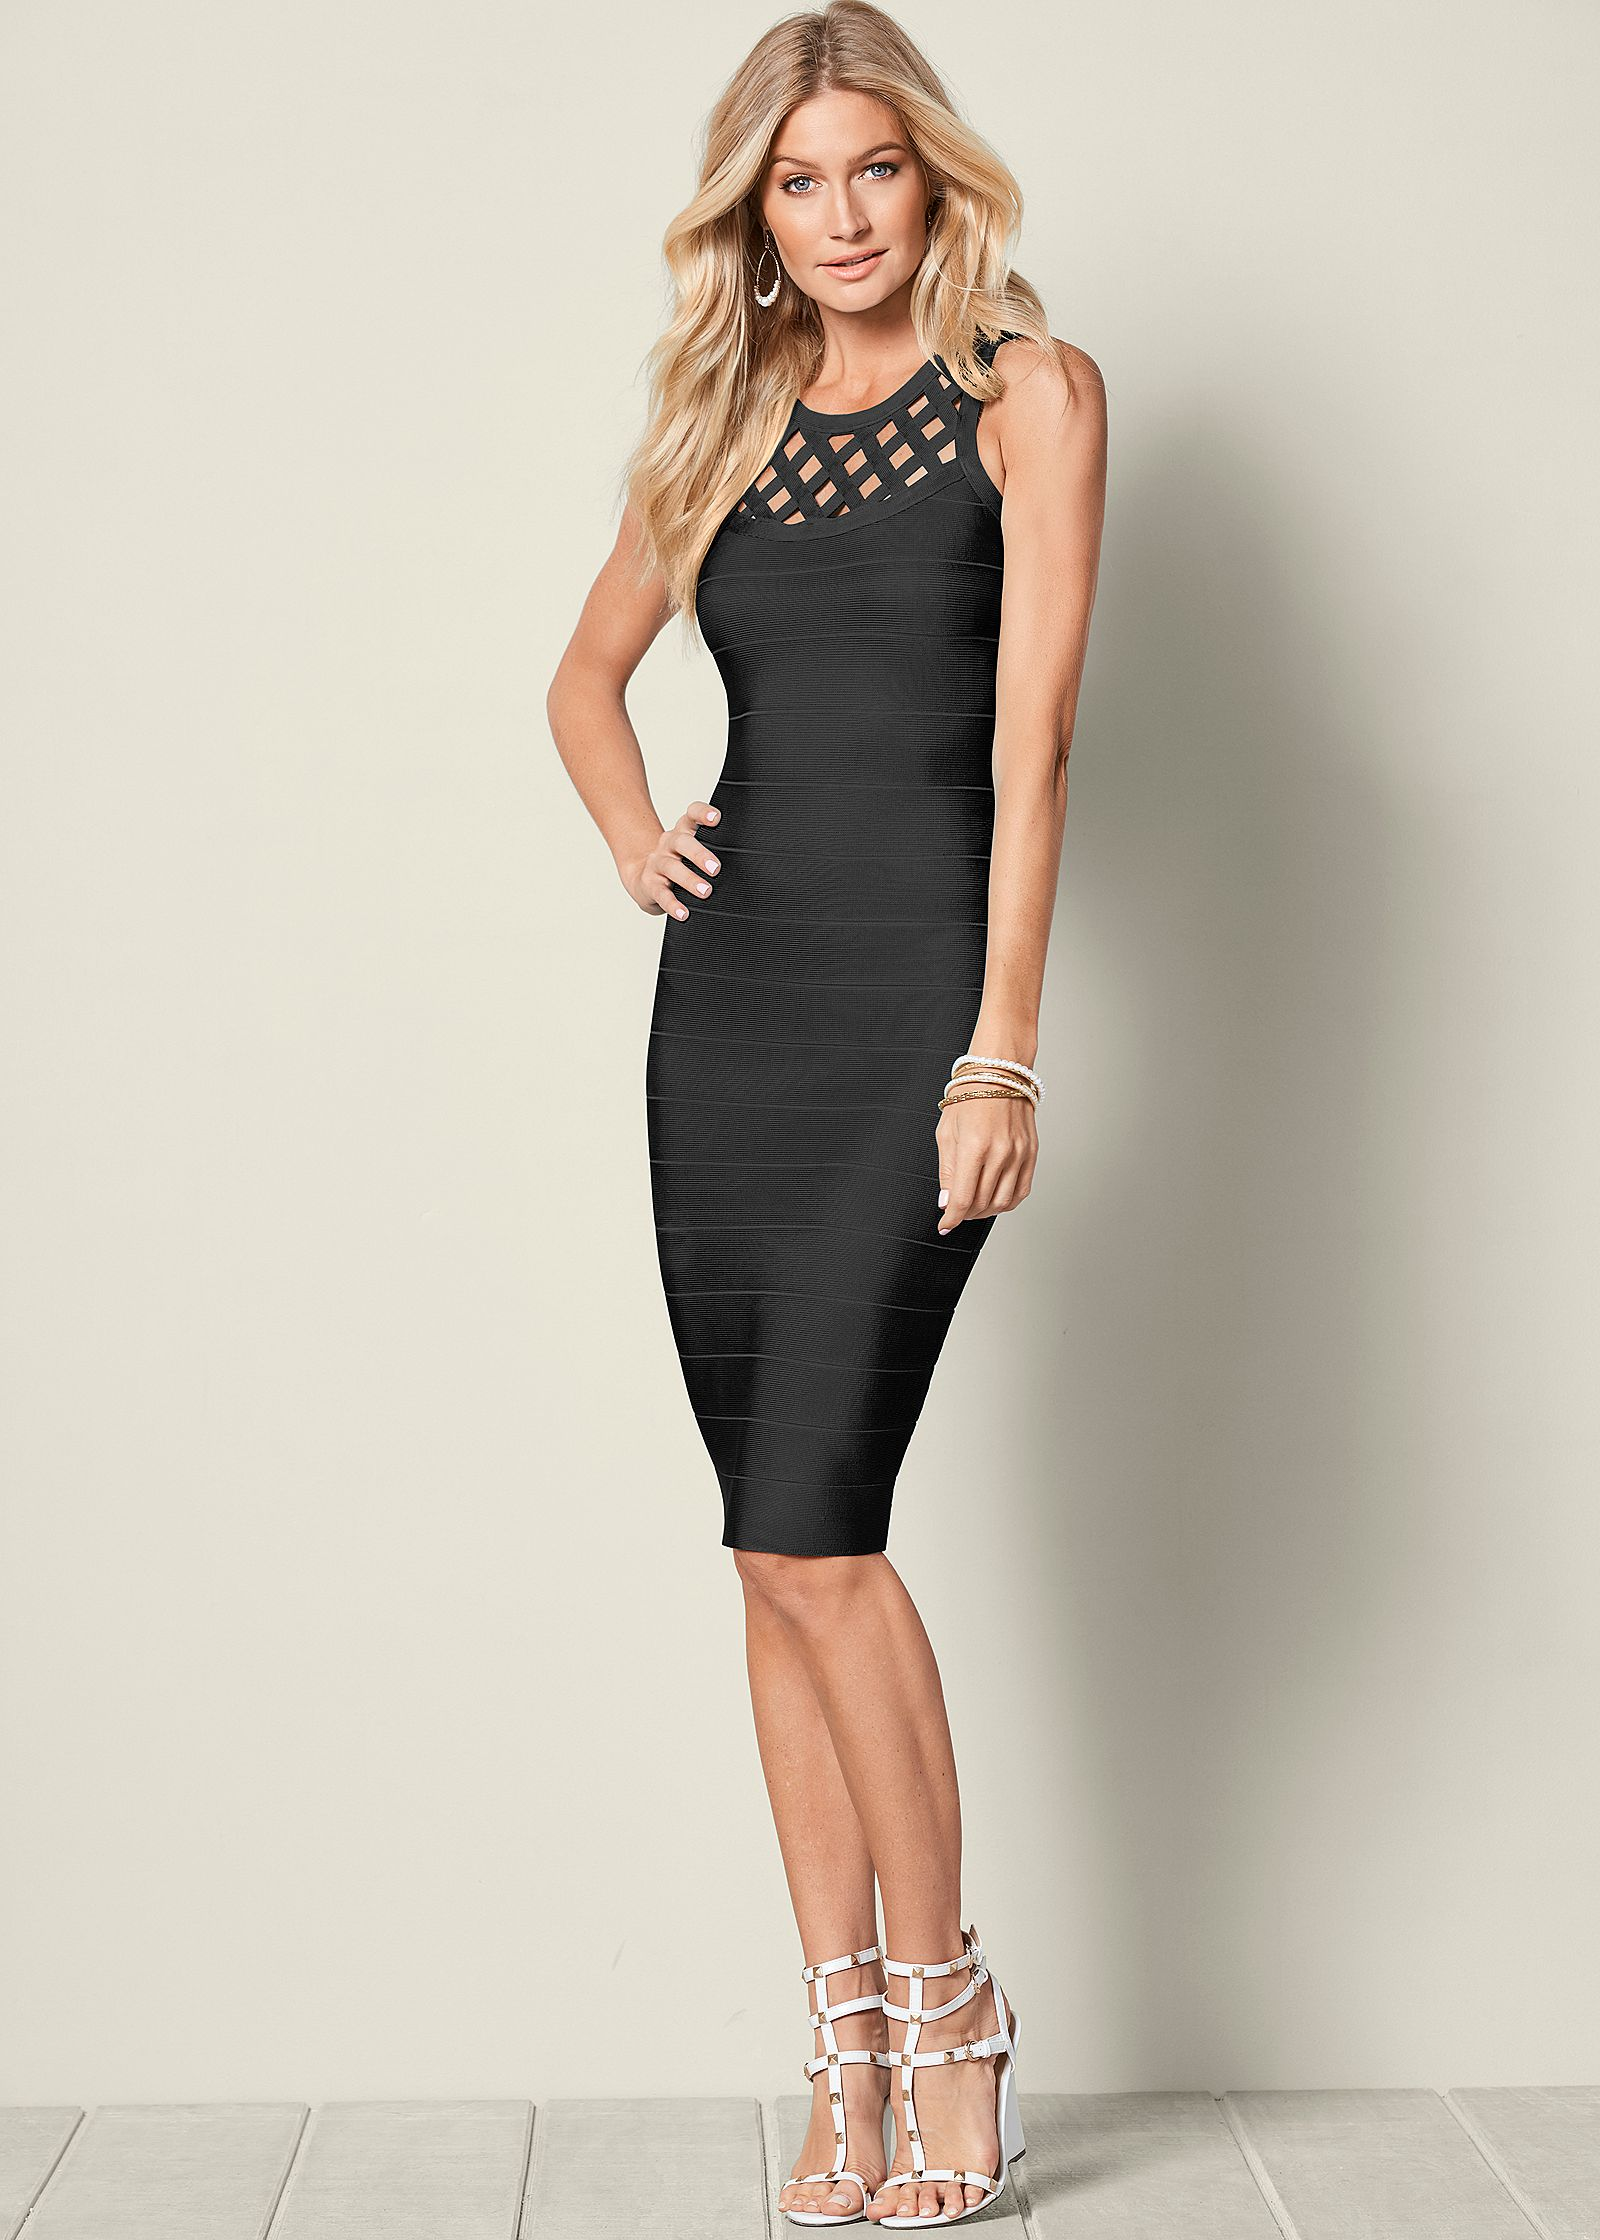 Black Wedges Dresses